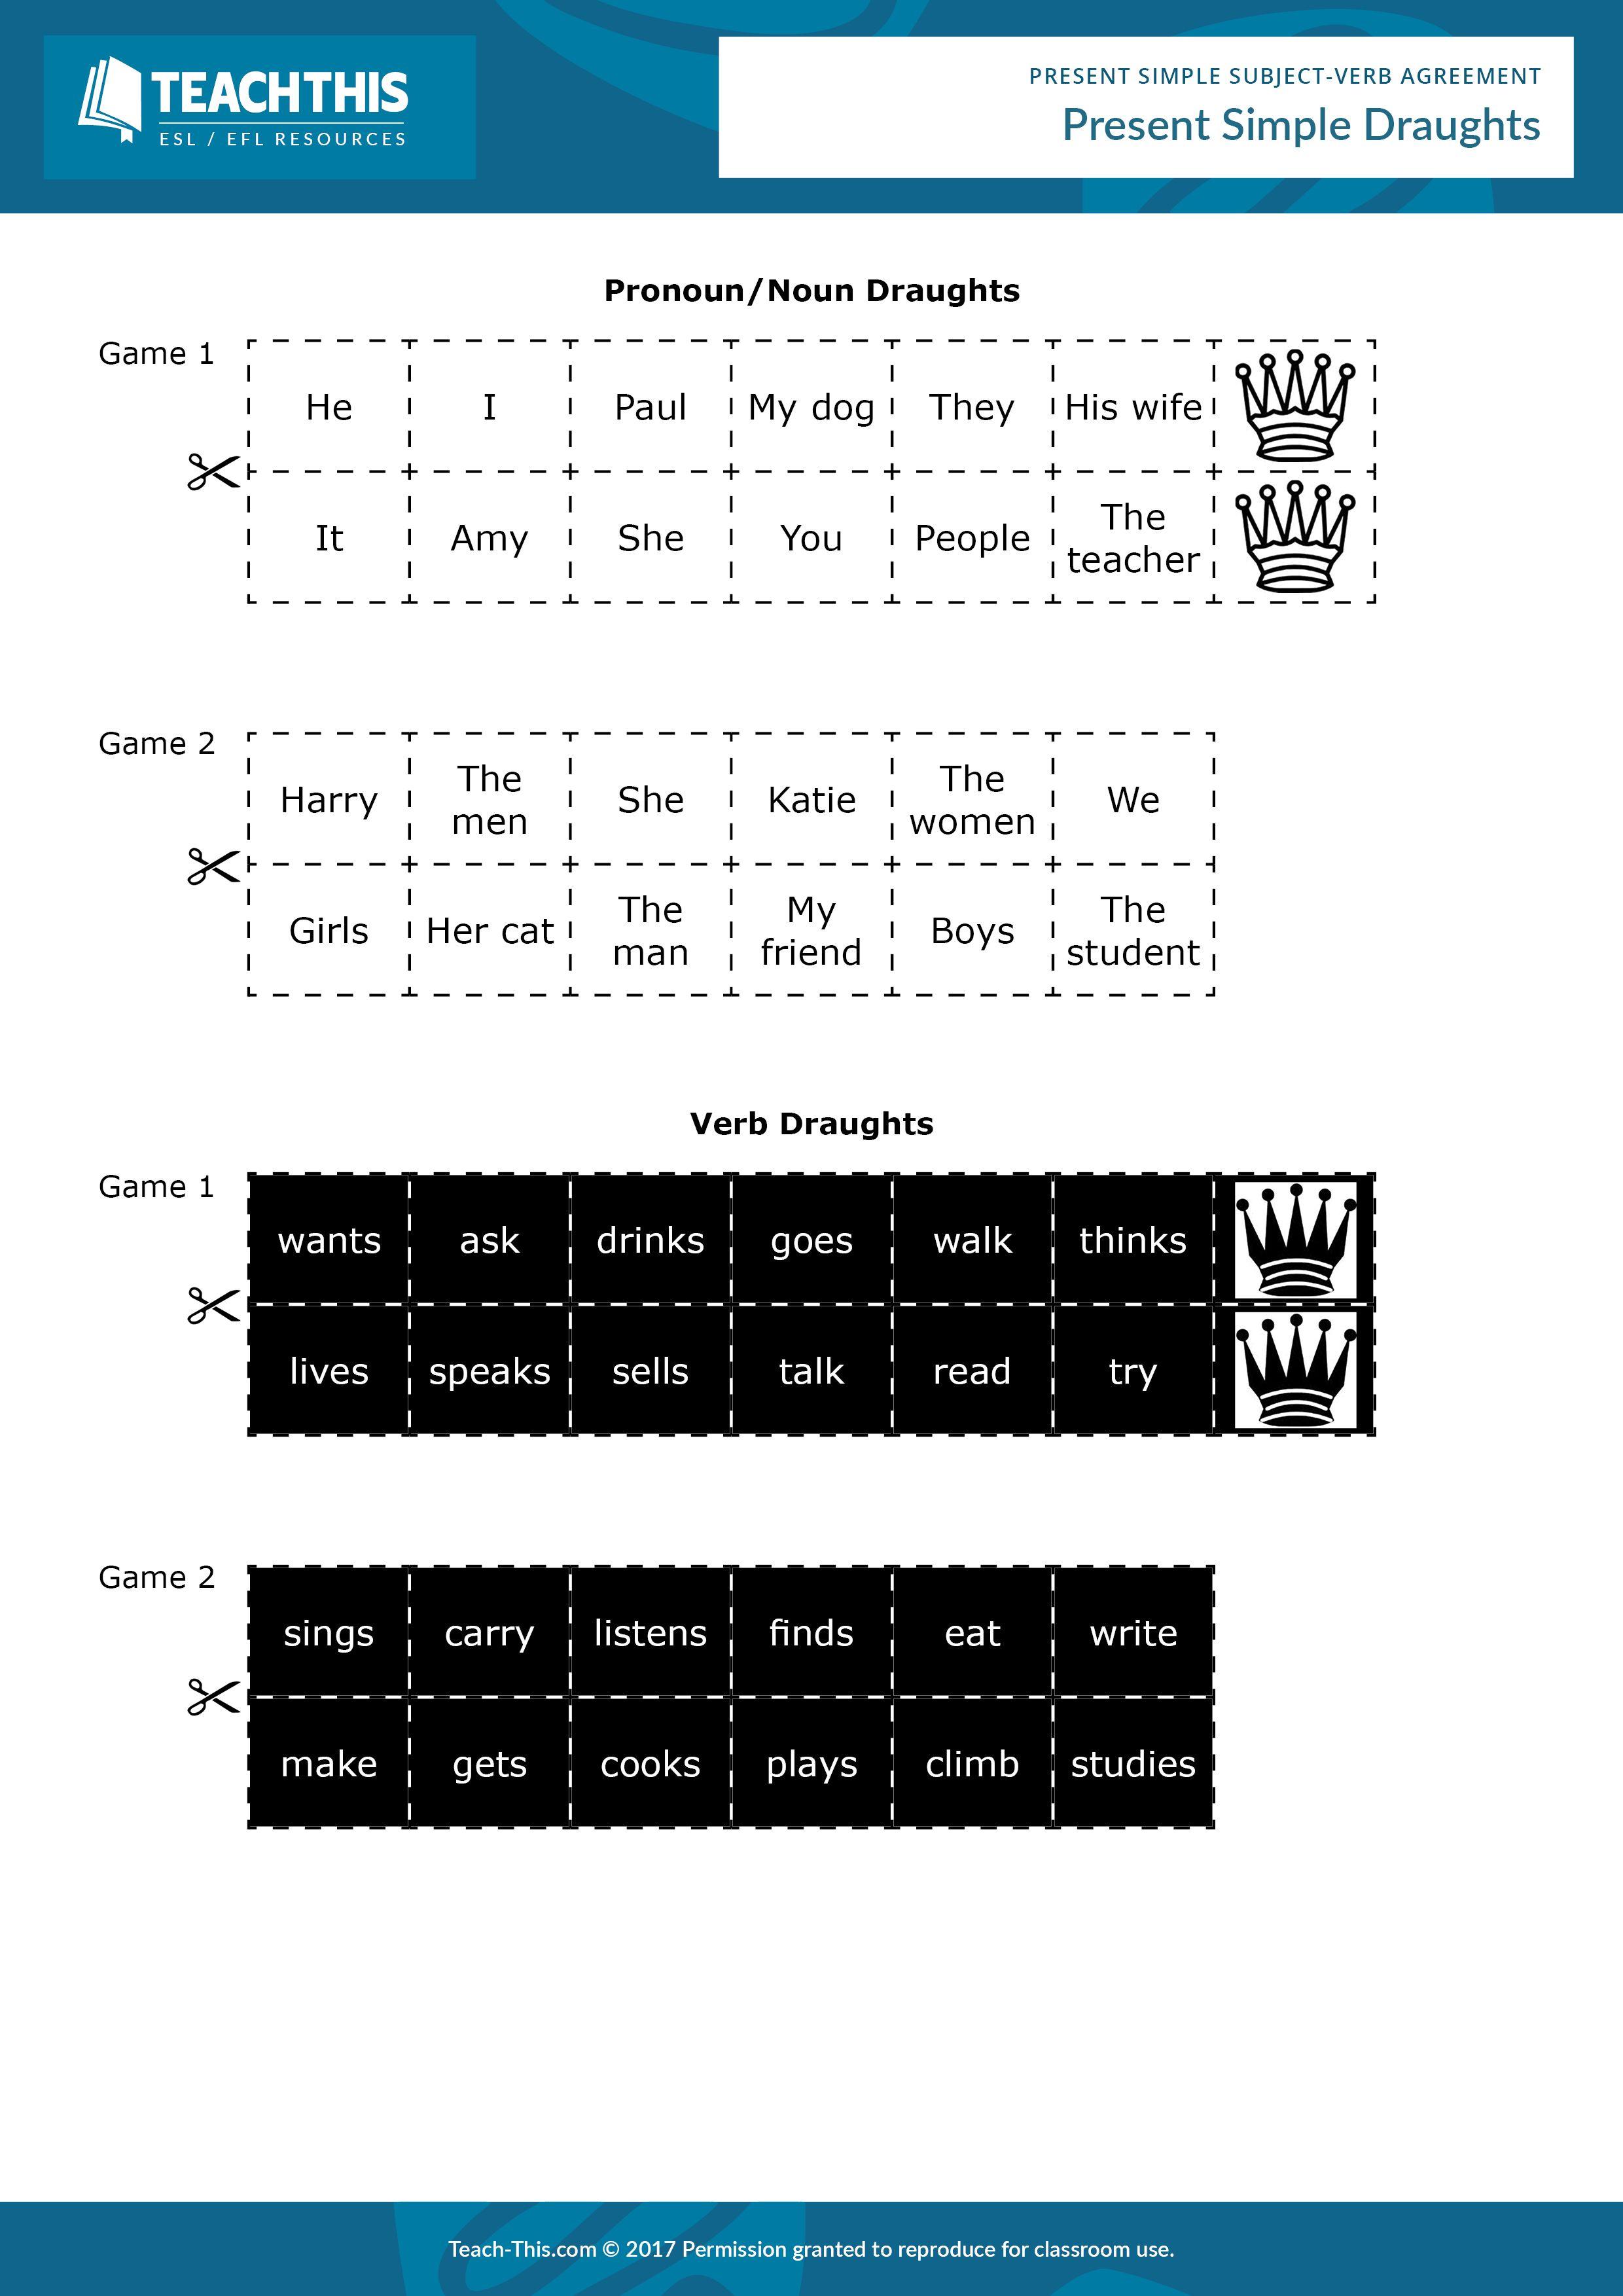 worksheet Subject Verb Agreement Esl Worksheet present simple subject verb agreement agreement